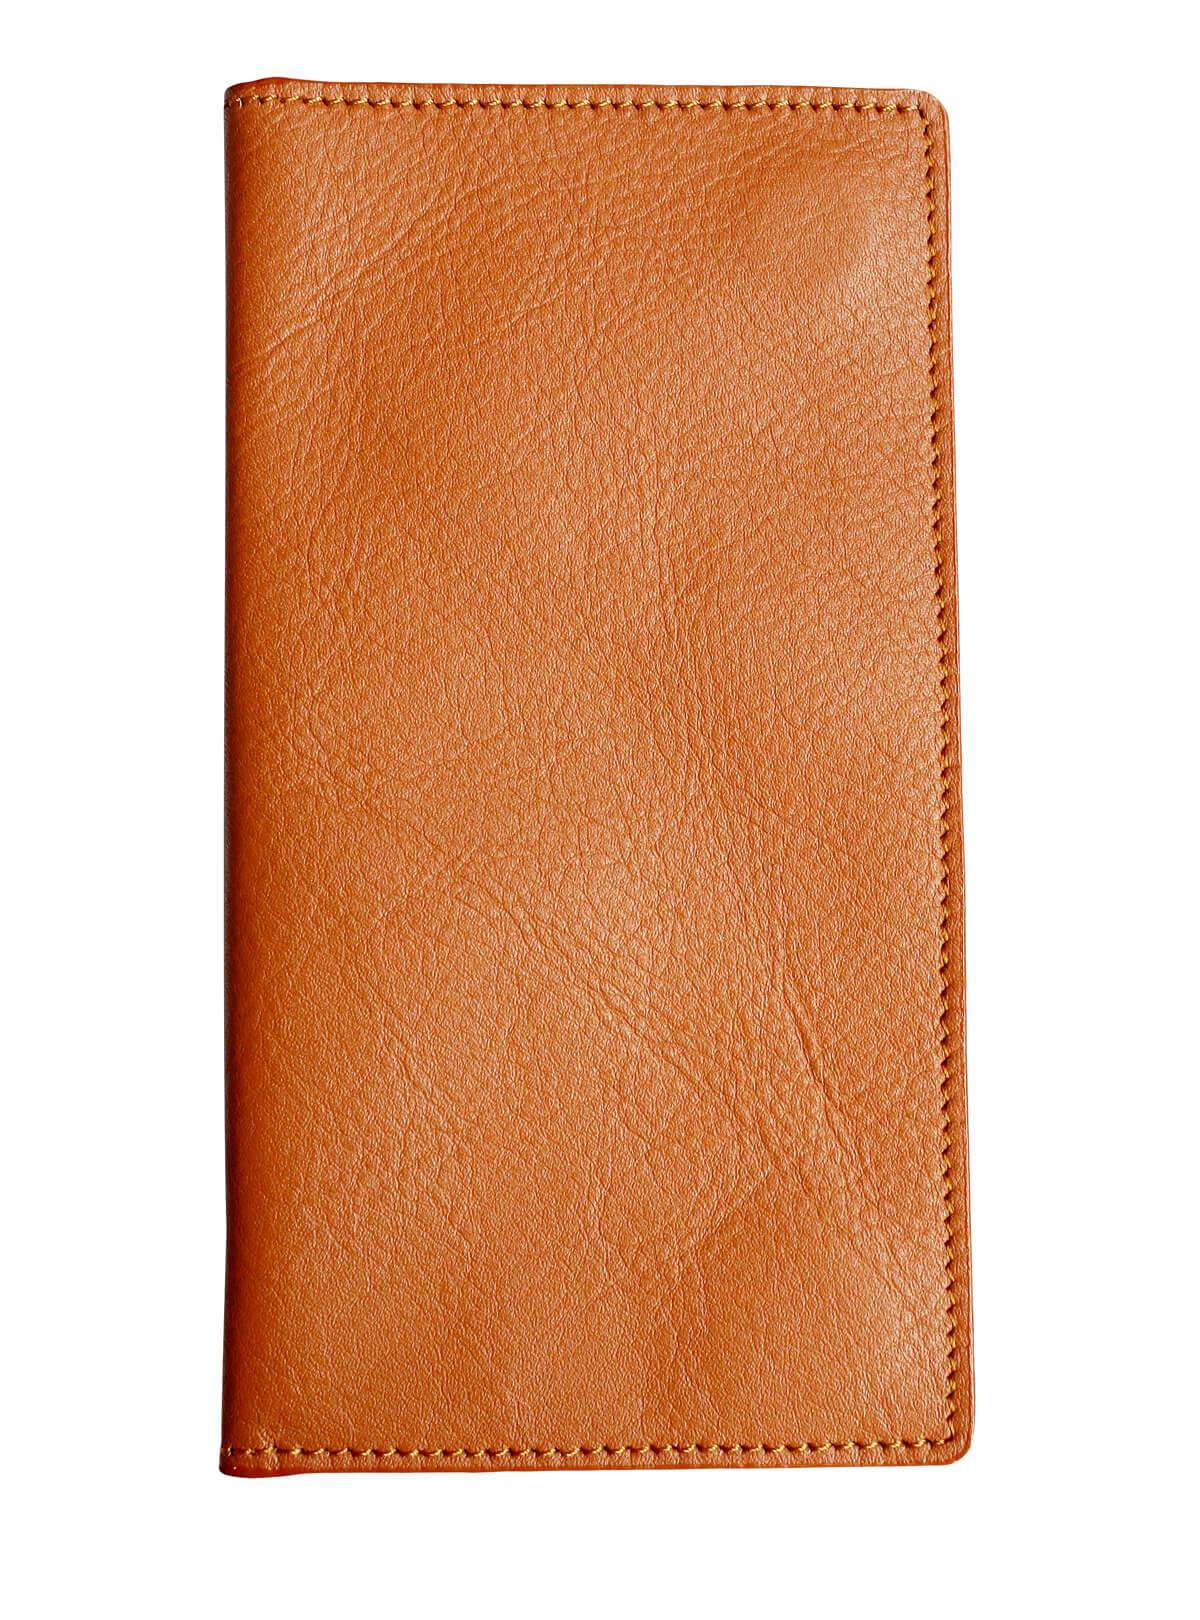 Tango Orange Leather Mobile Cover